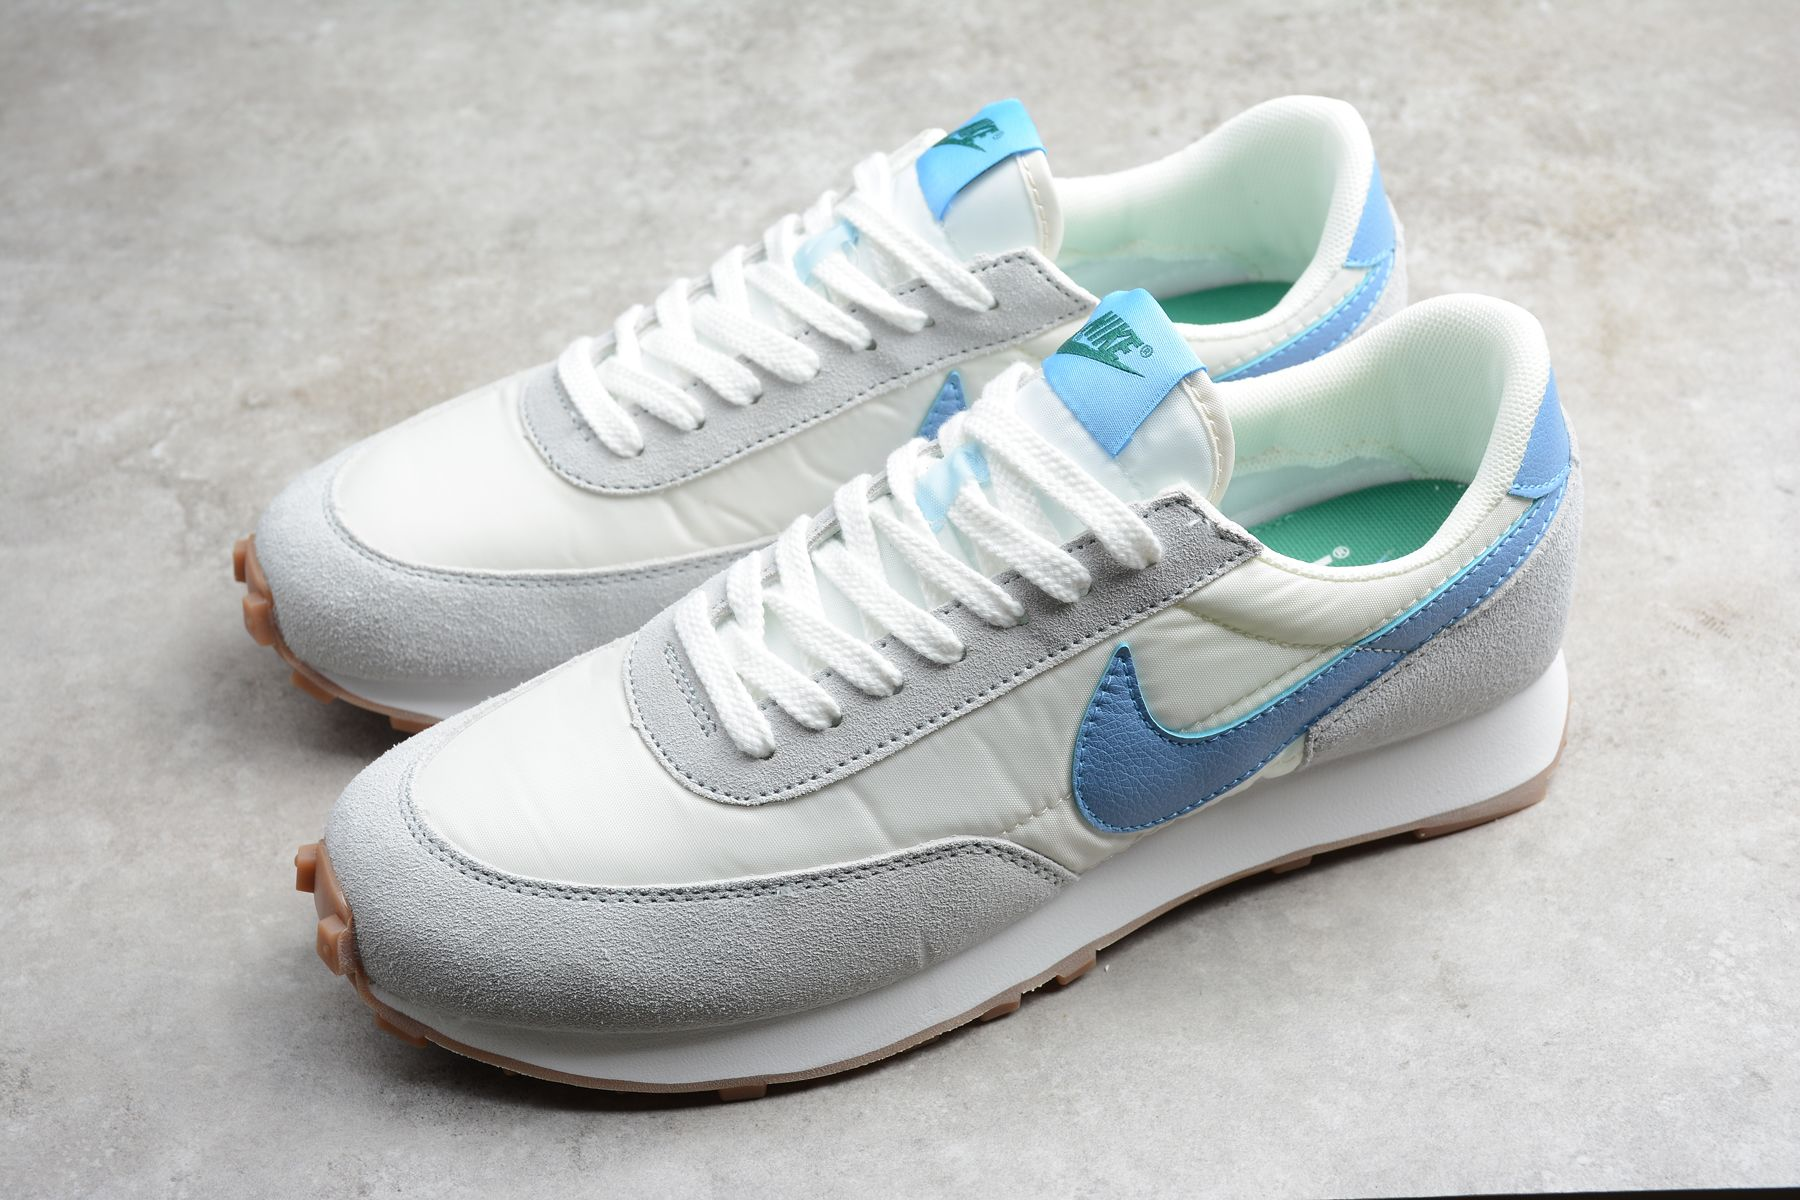 Nike Daybreak Blue Grey Upper